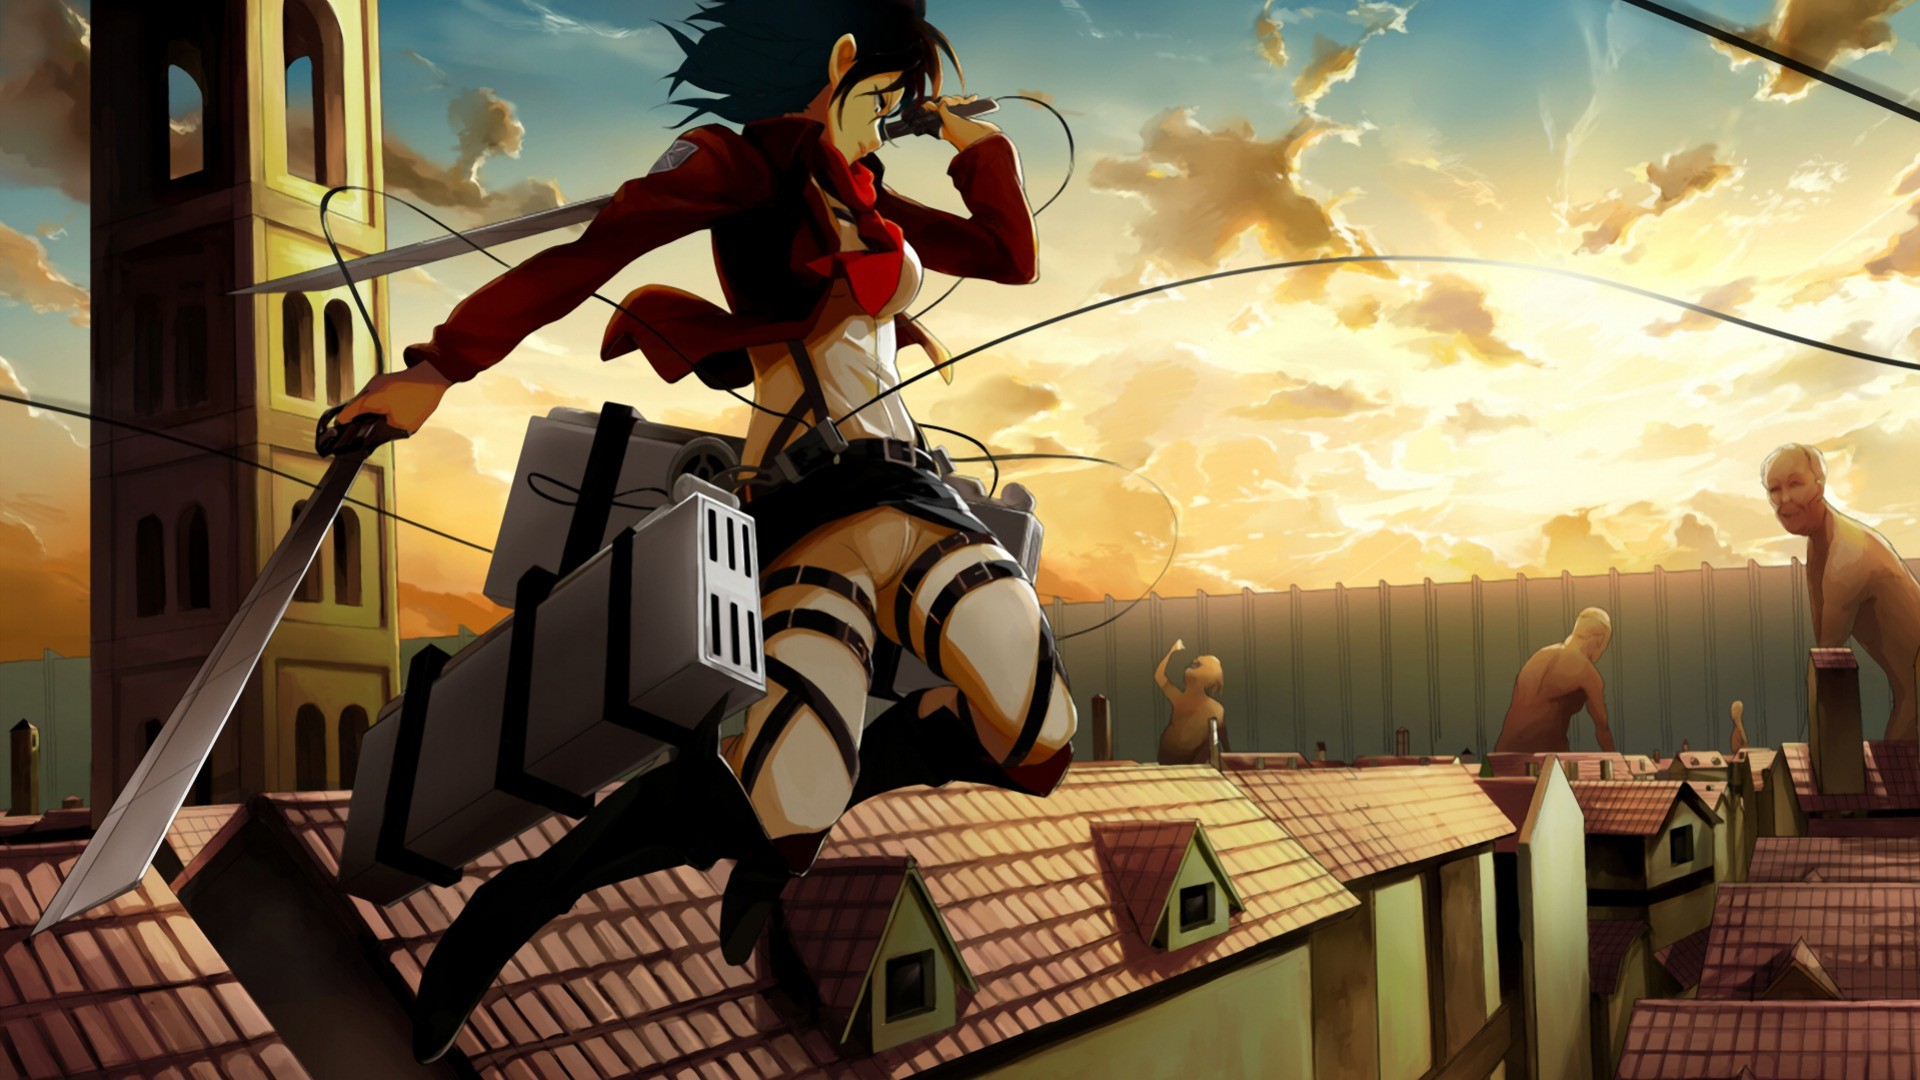 Shingeki No Kyojin Mikasa Ackerman Hd Wallpaper Background Image 1920x1080 Id 607880 Wallpaper Abyss